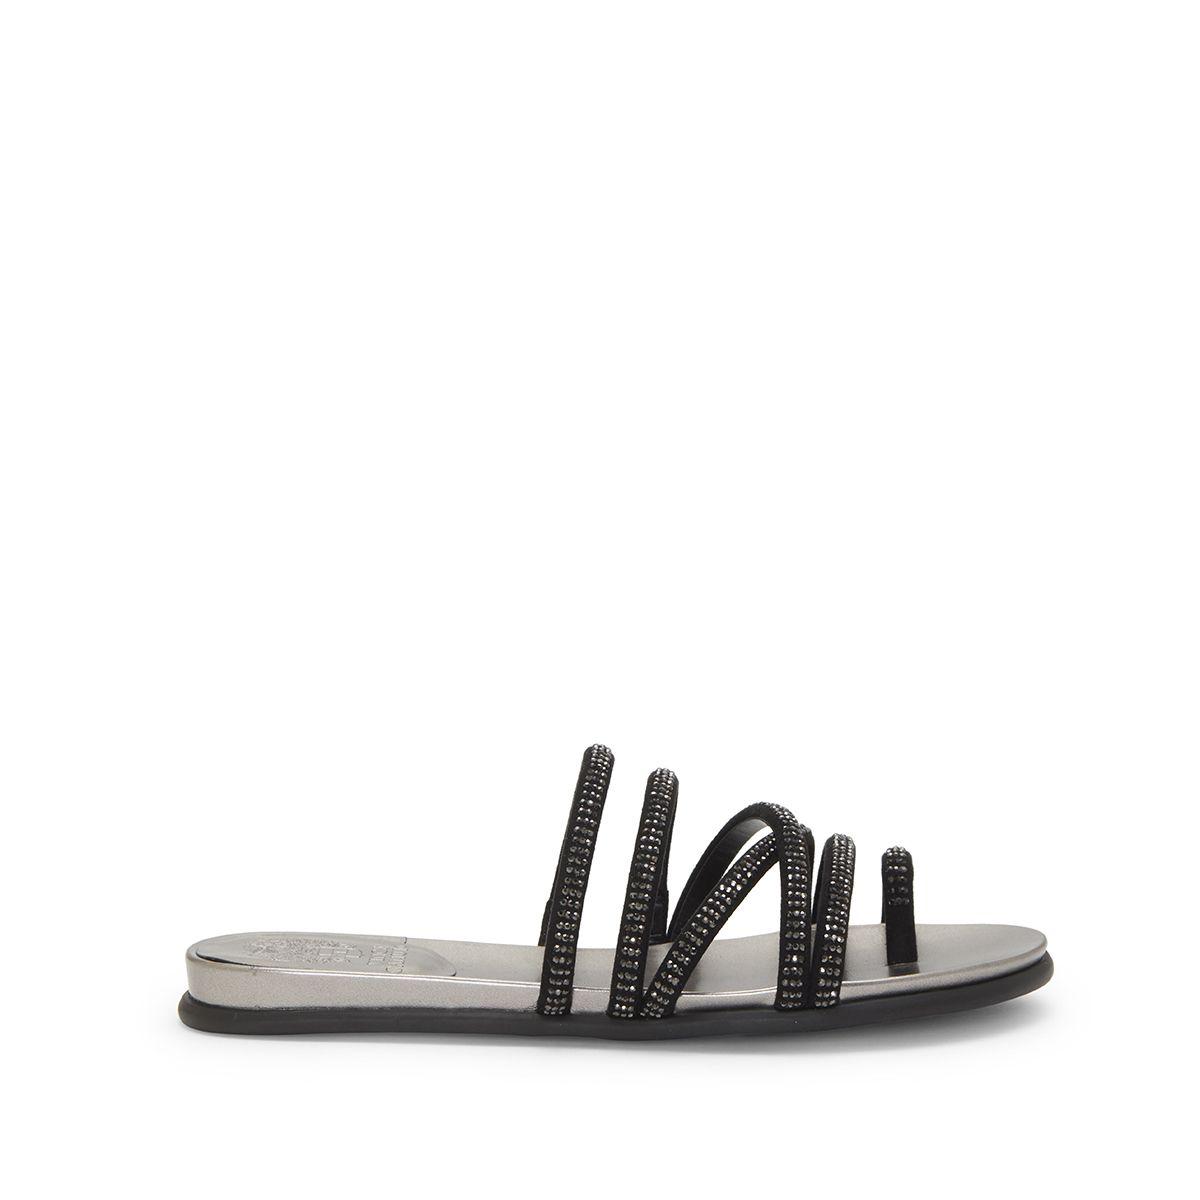 b20e7a3b7eef2e Vince Camuto Shoes - Macy s